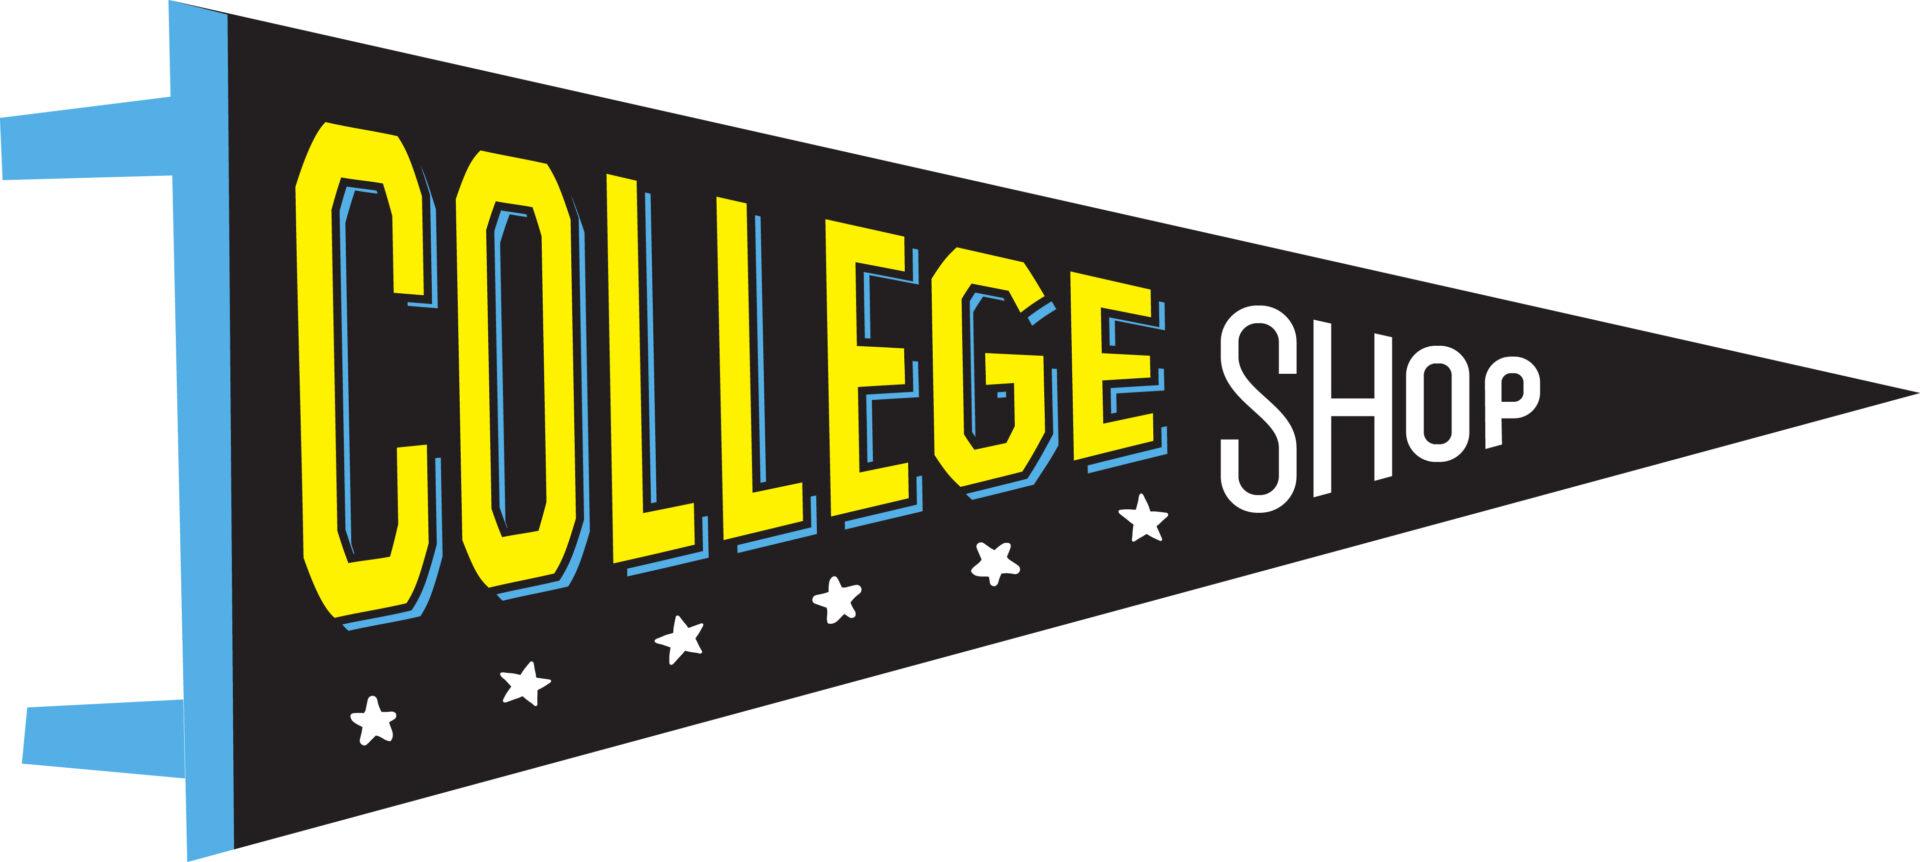 https://stacyknows.com/wp-content/uploads/2015/07/college-shop-banner.jpg